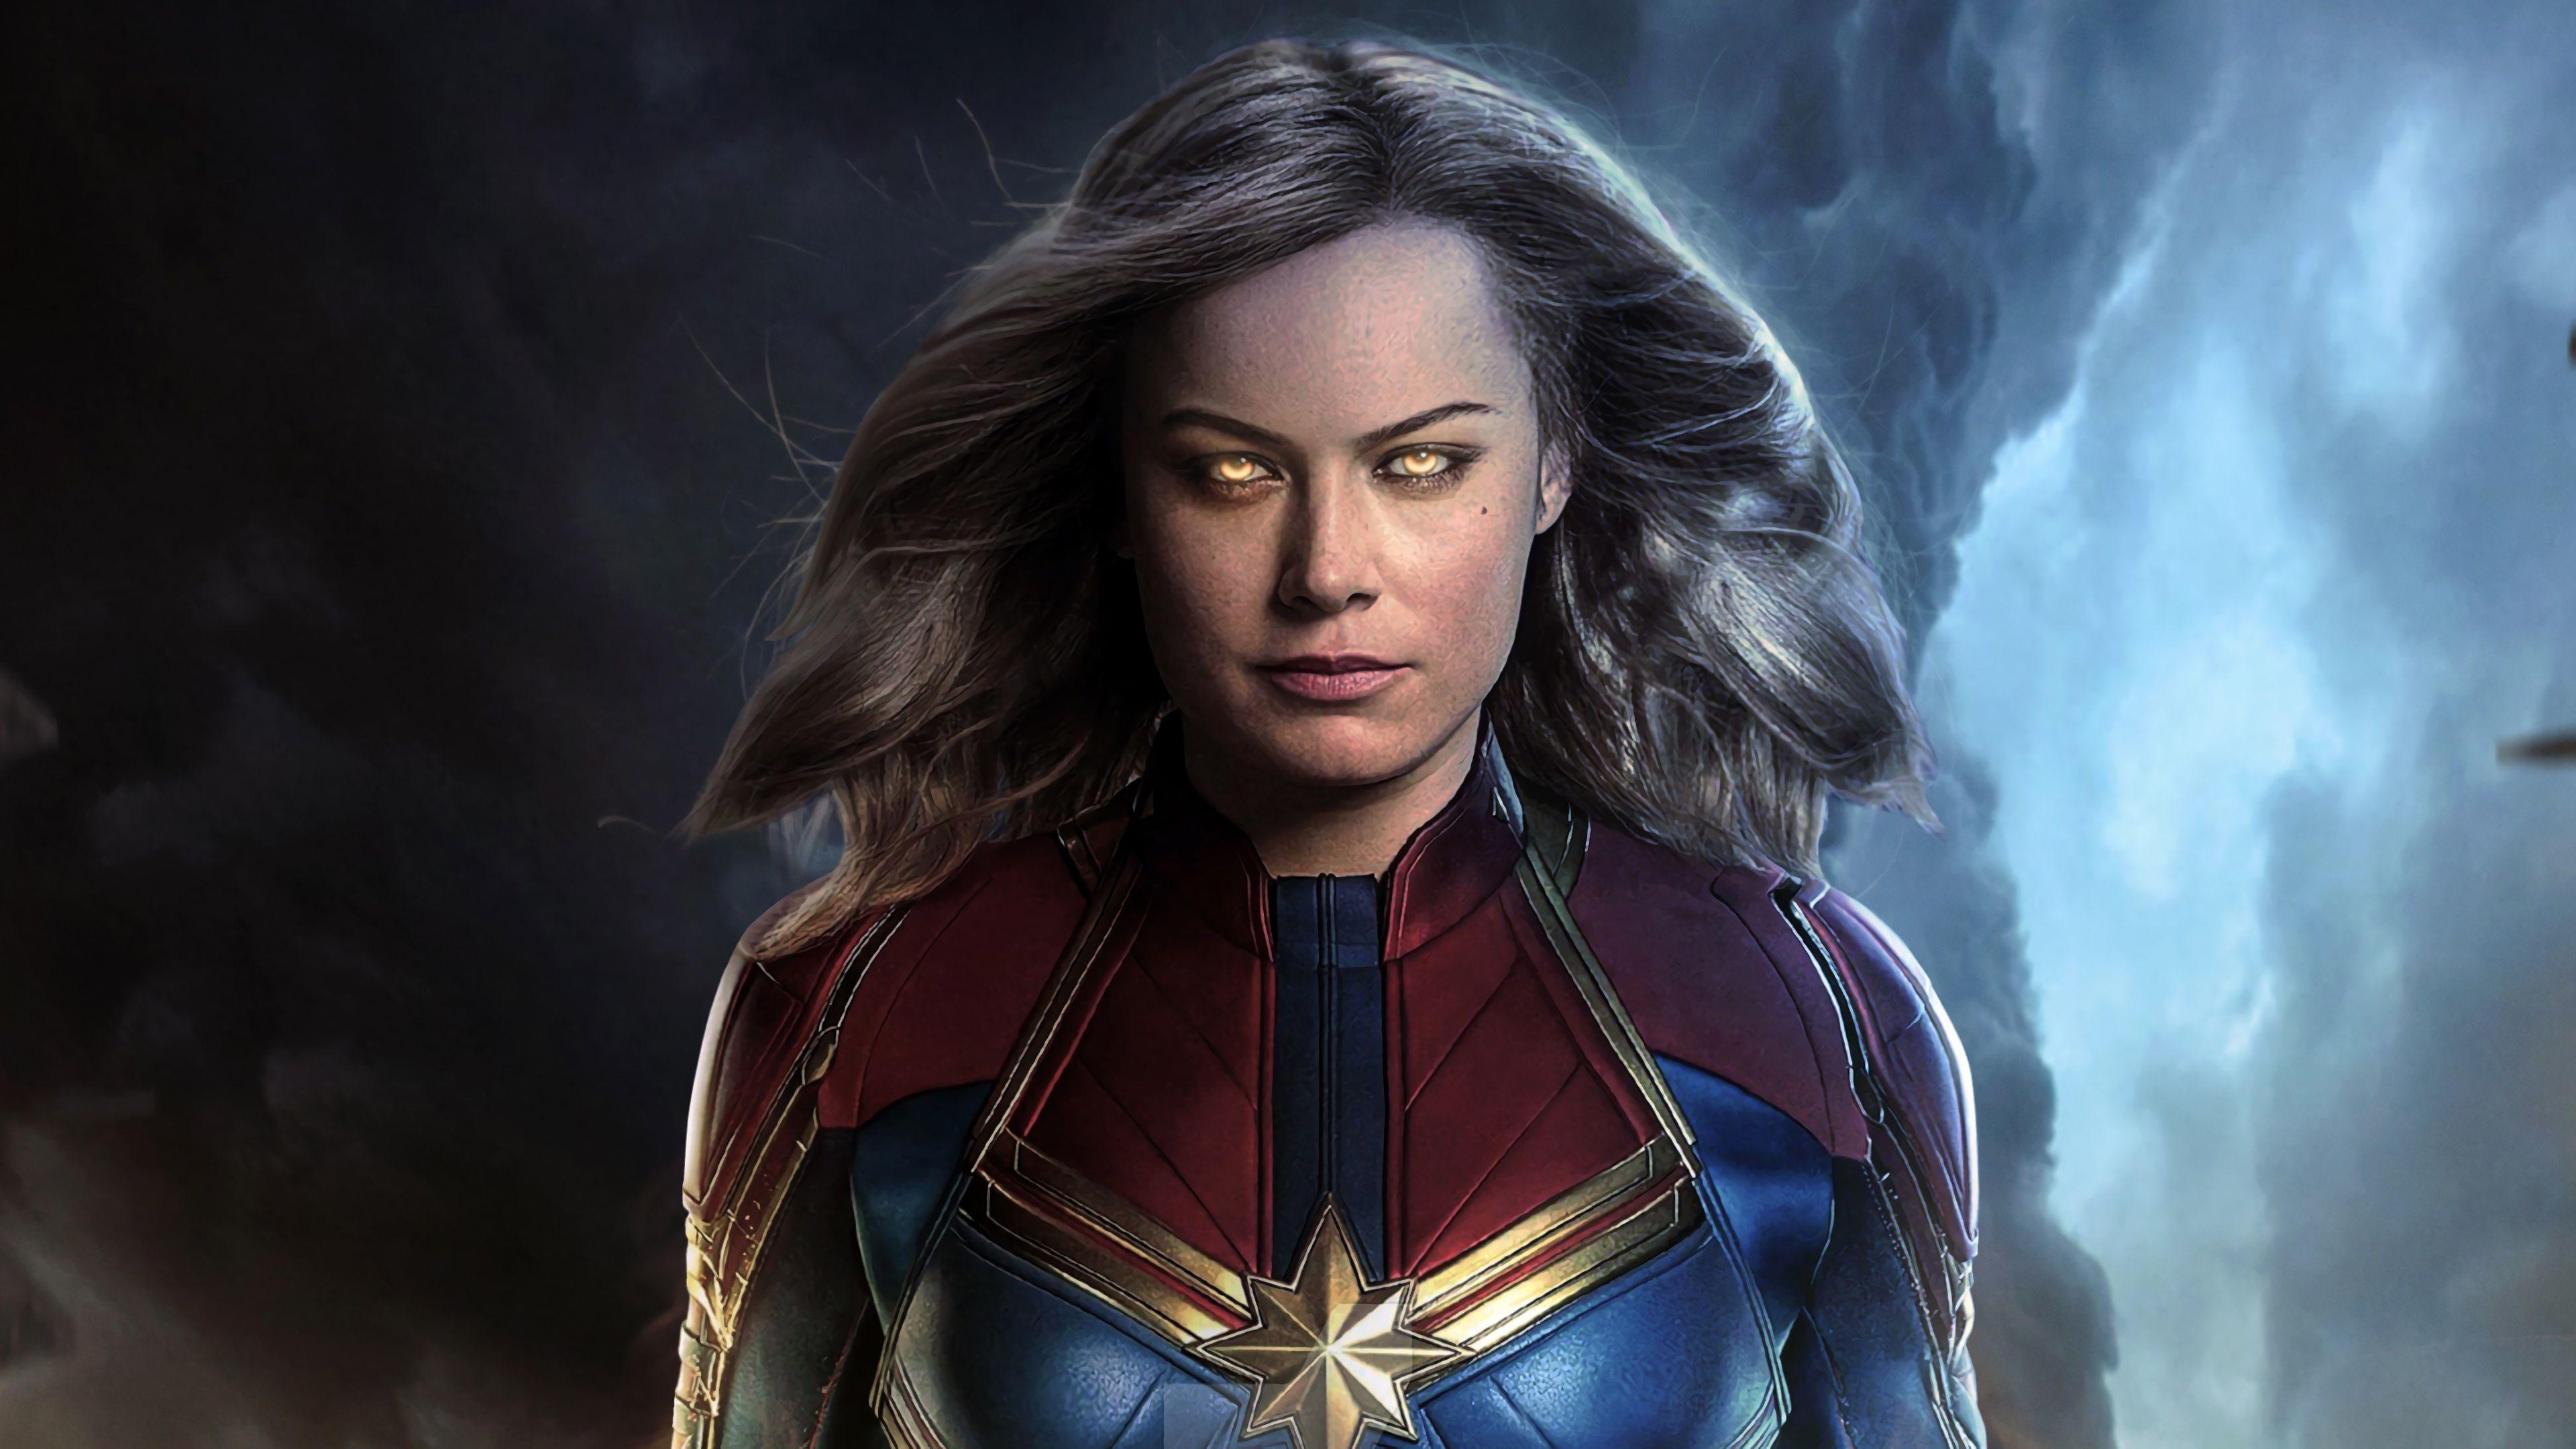 Captain Marvel Movie 2019 Brie Larson As Carol Danvers 4k Wallpaper Captain Marvel Movie 2019 Captain Marvel Carol Danv Captain Marvel Marvel Marvel Movies